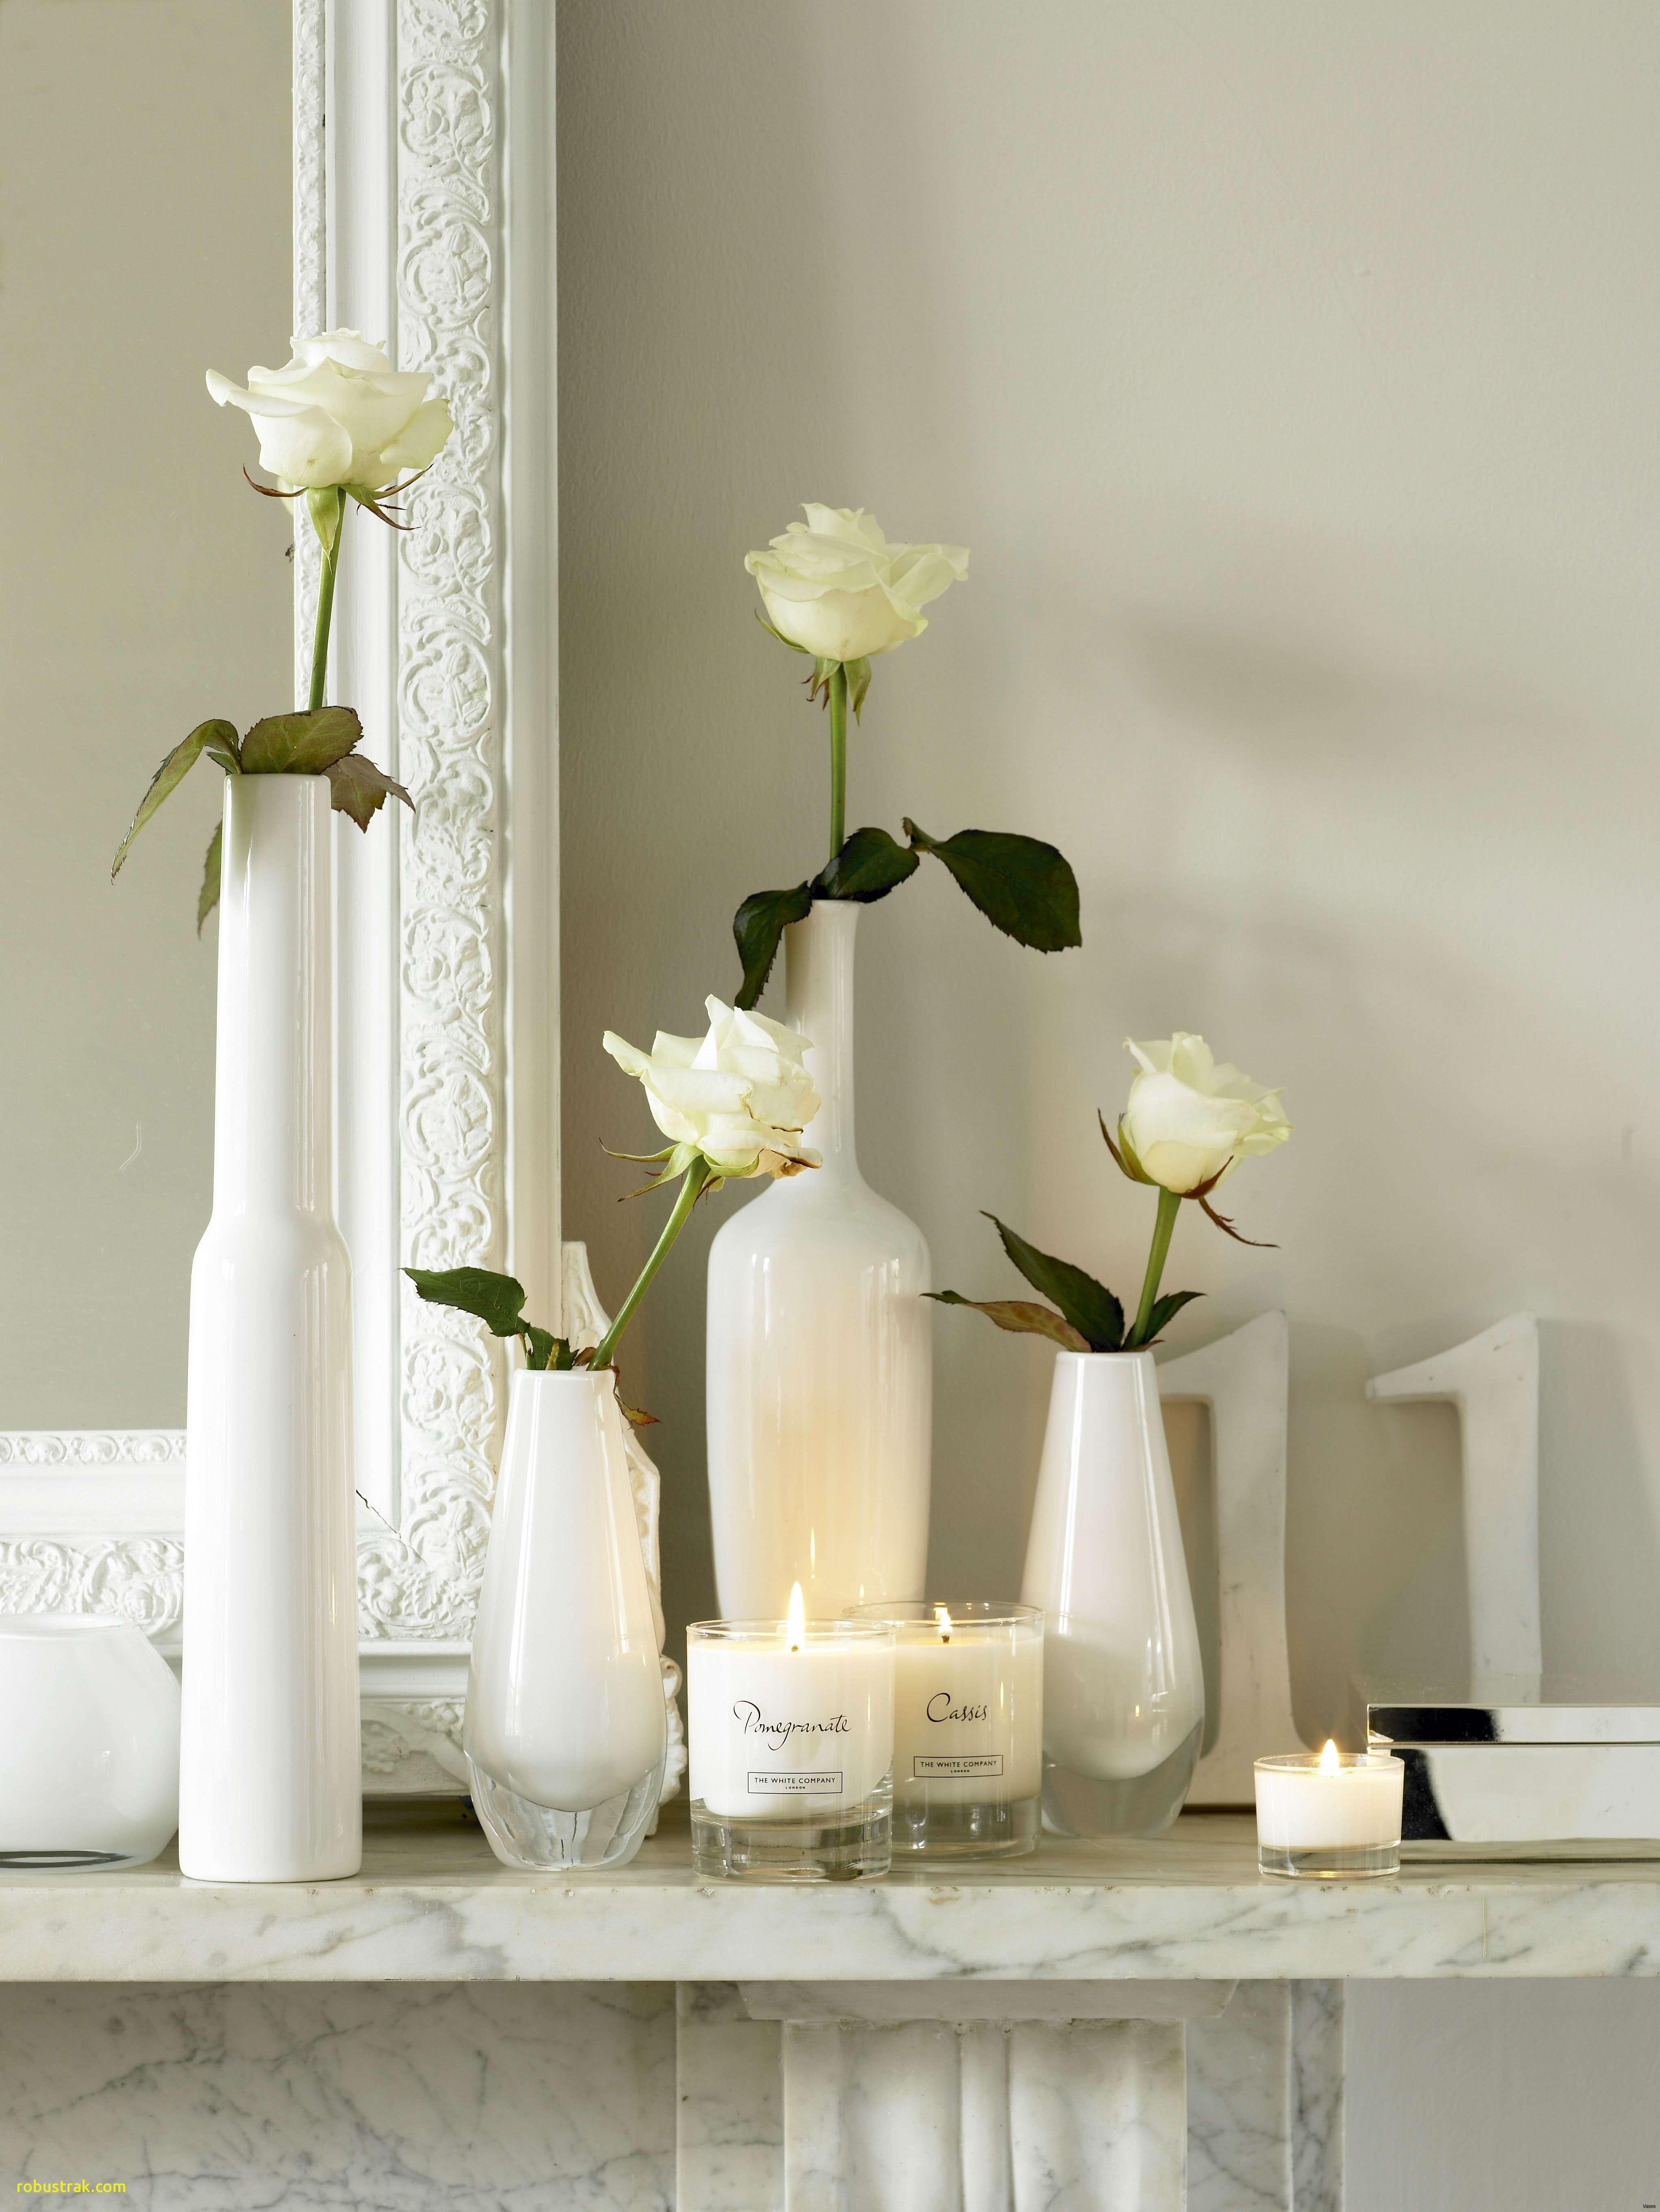 vintage glass vases of elegant decorating with vases home design ideas in vases decoration 15 ideas decorating with vasesi 15d vases decoration h decorationi 0d